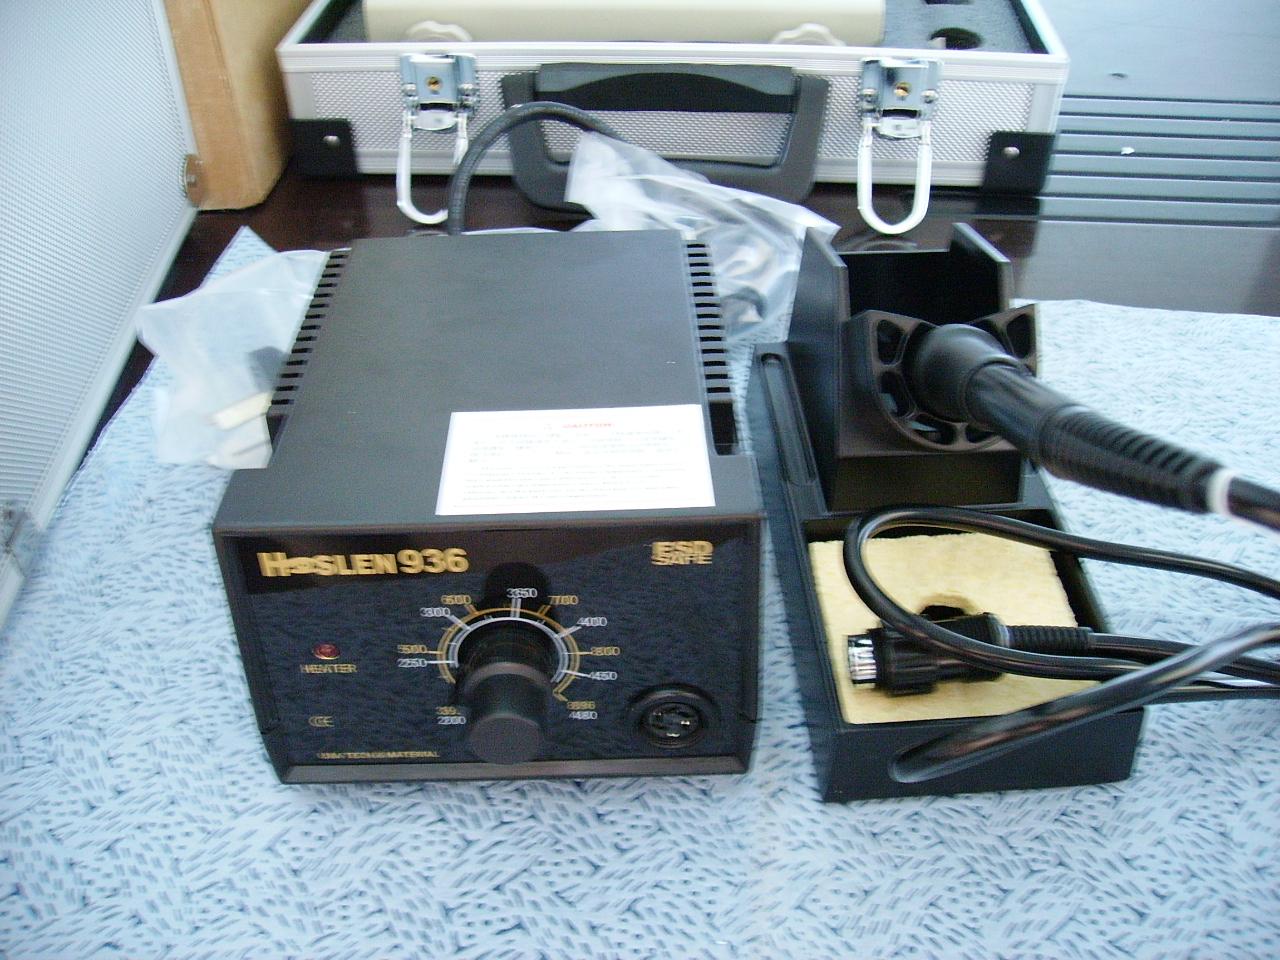 hs-936esd可调式恒温烙铁焊台